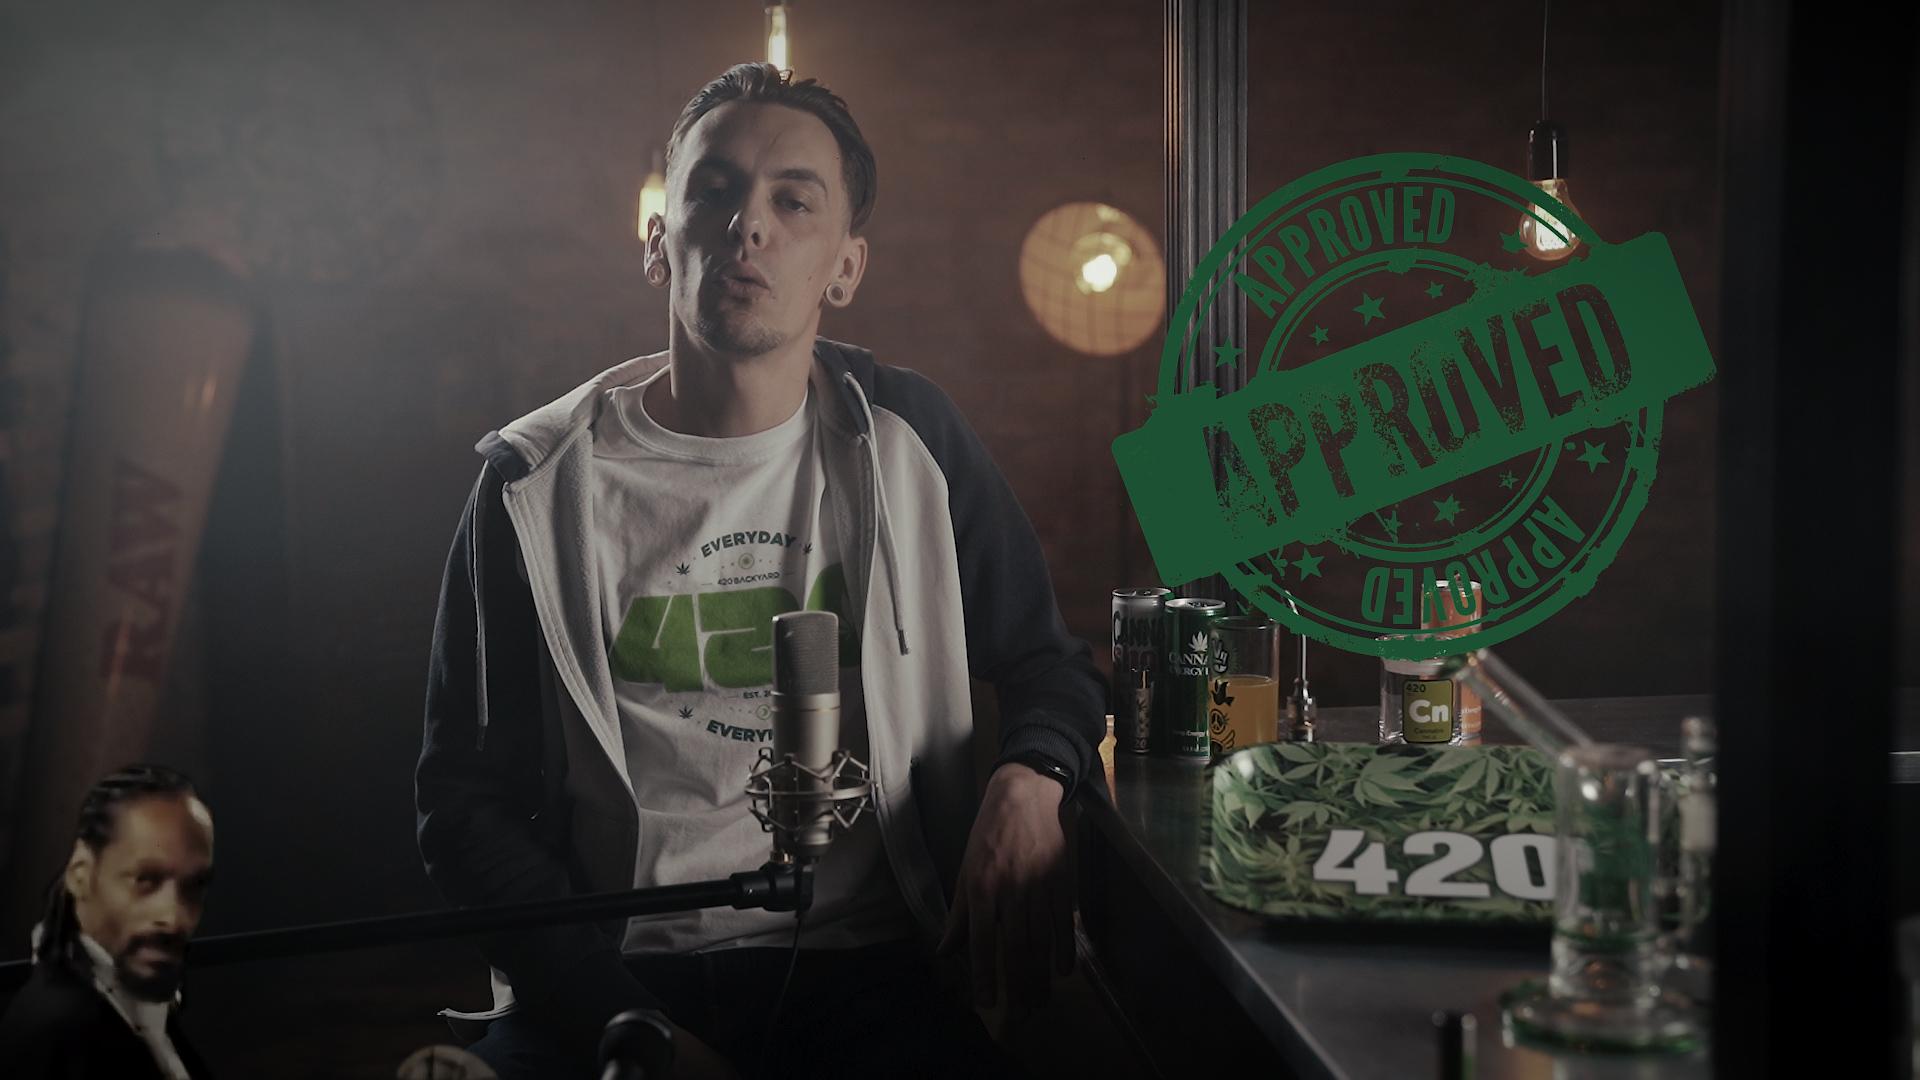 420 legalisation